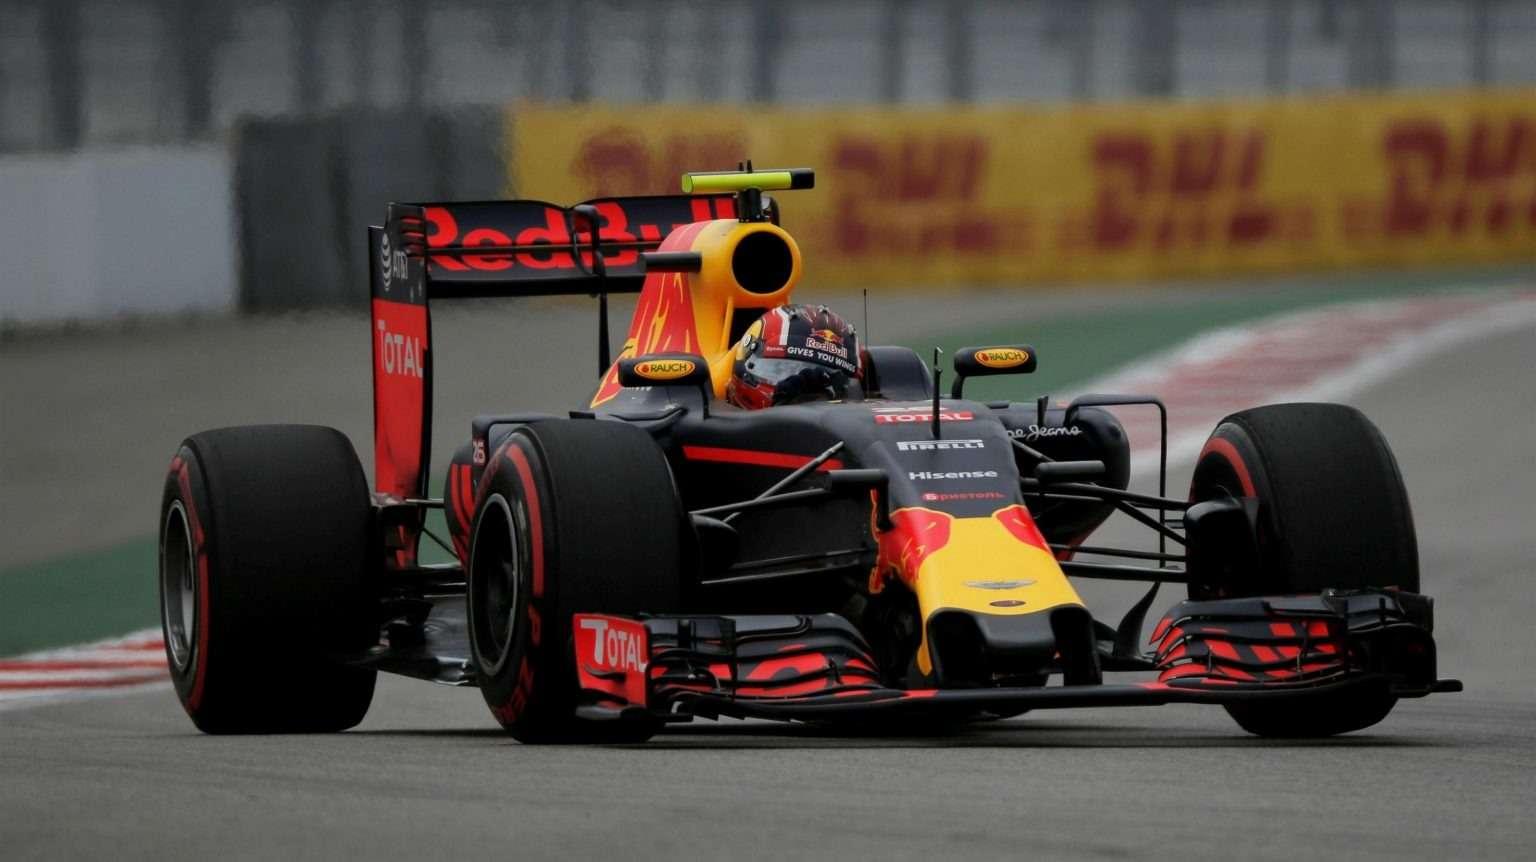 Даниил Квят, Red Bull Racing, Формула 1, Сочи, Сочи Автодром, Гран При России